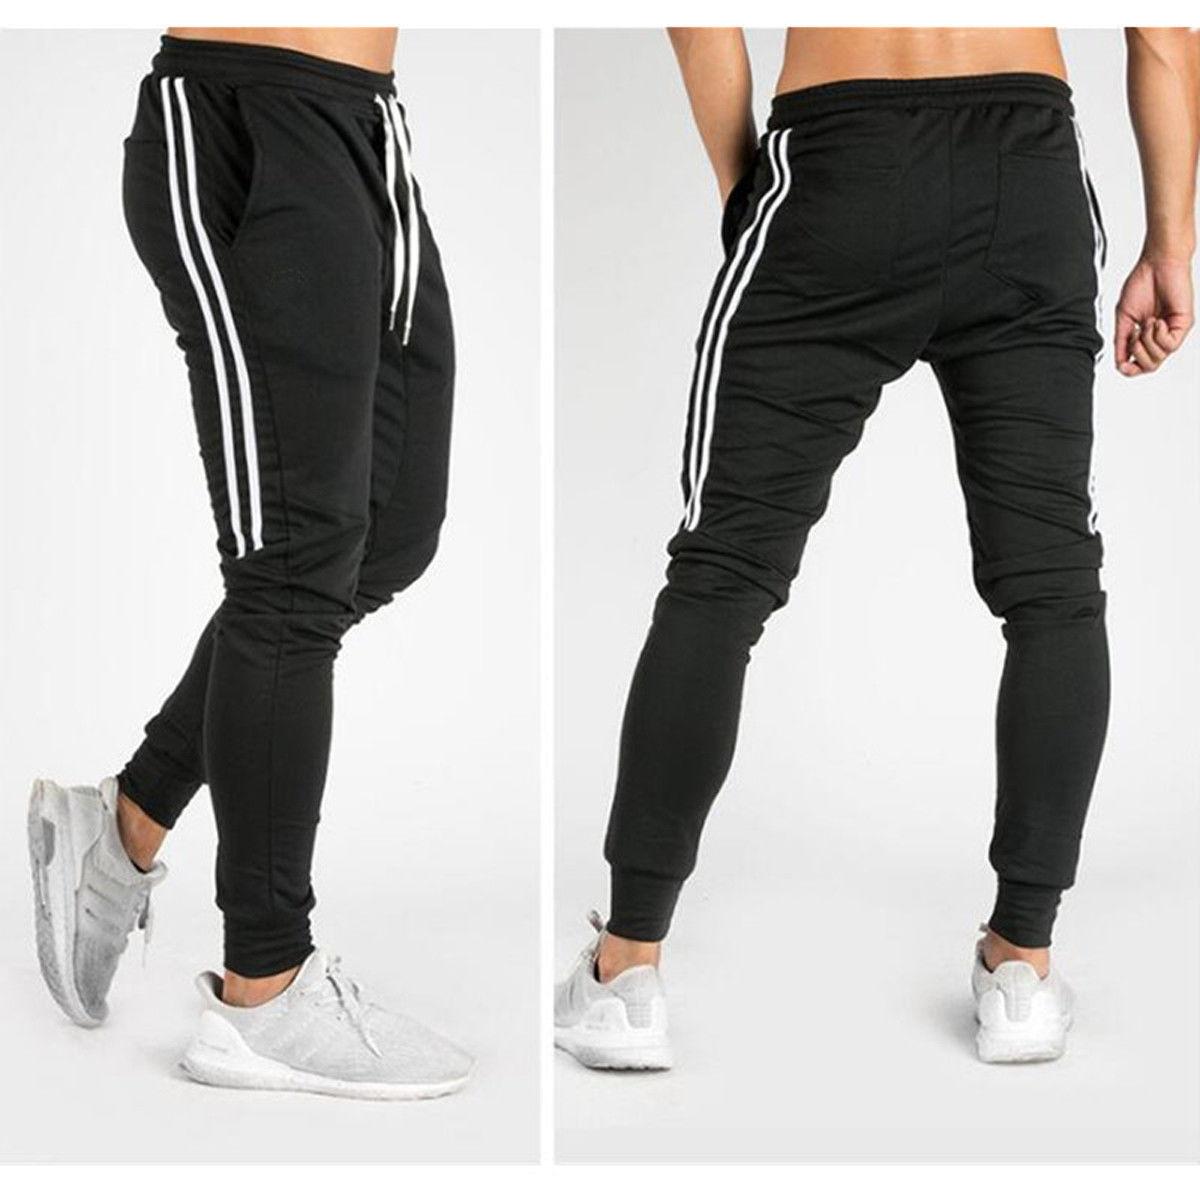 New Men's Hip Hop Sweatpants Fitness Joggers 2020 Spring Male Side Stripe High Street Hip Long Trousers Harem Pants Sweatpant